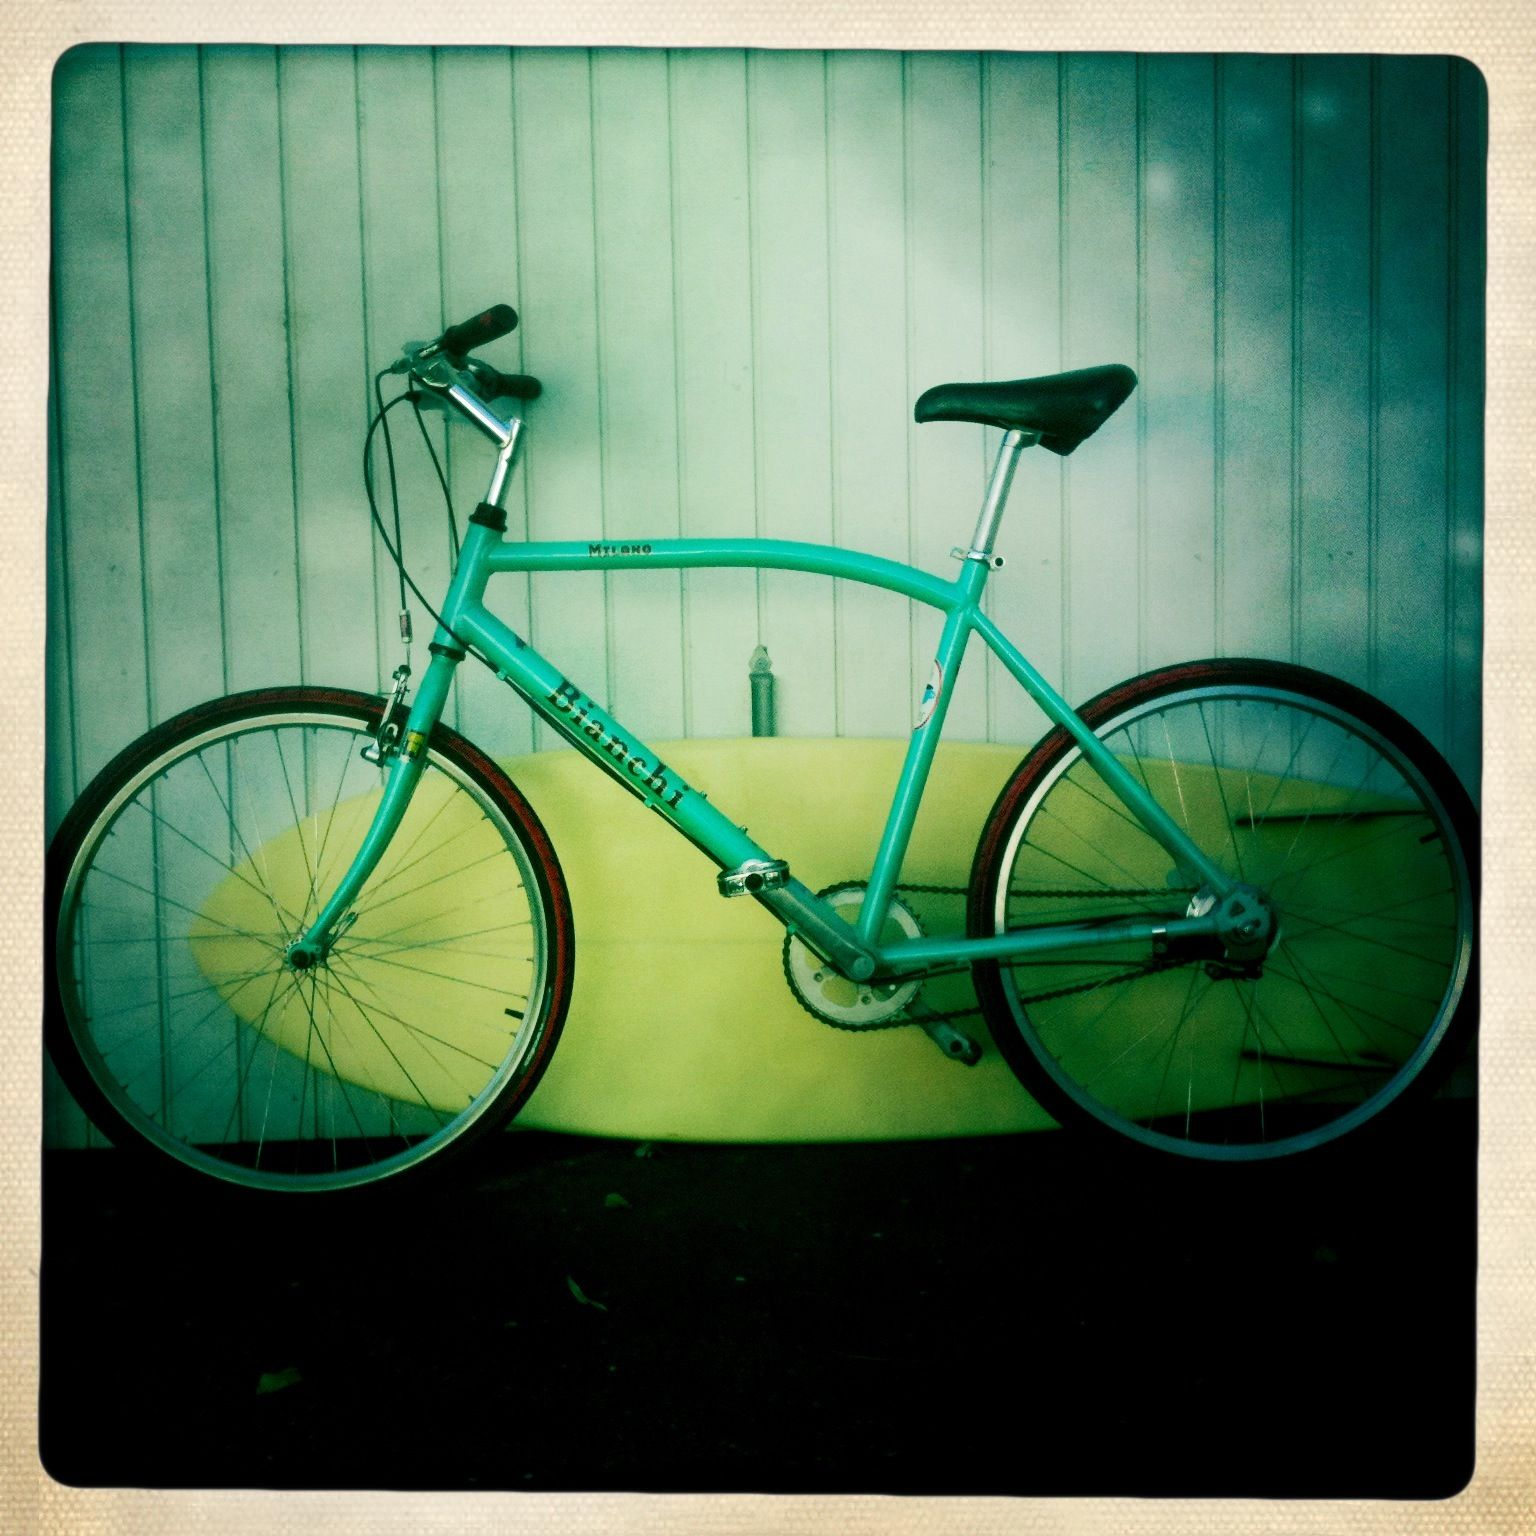 Bianchi Milano - Nothing better to bike around Seattle